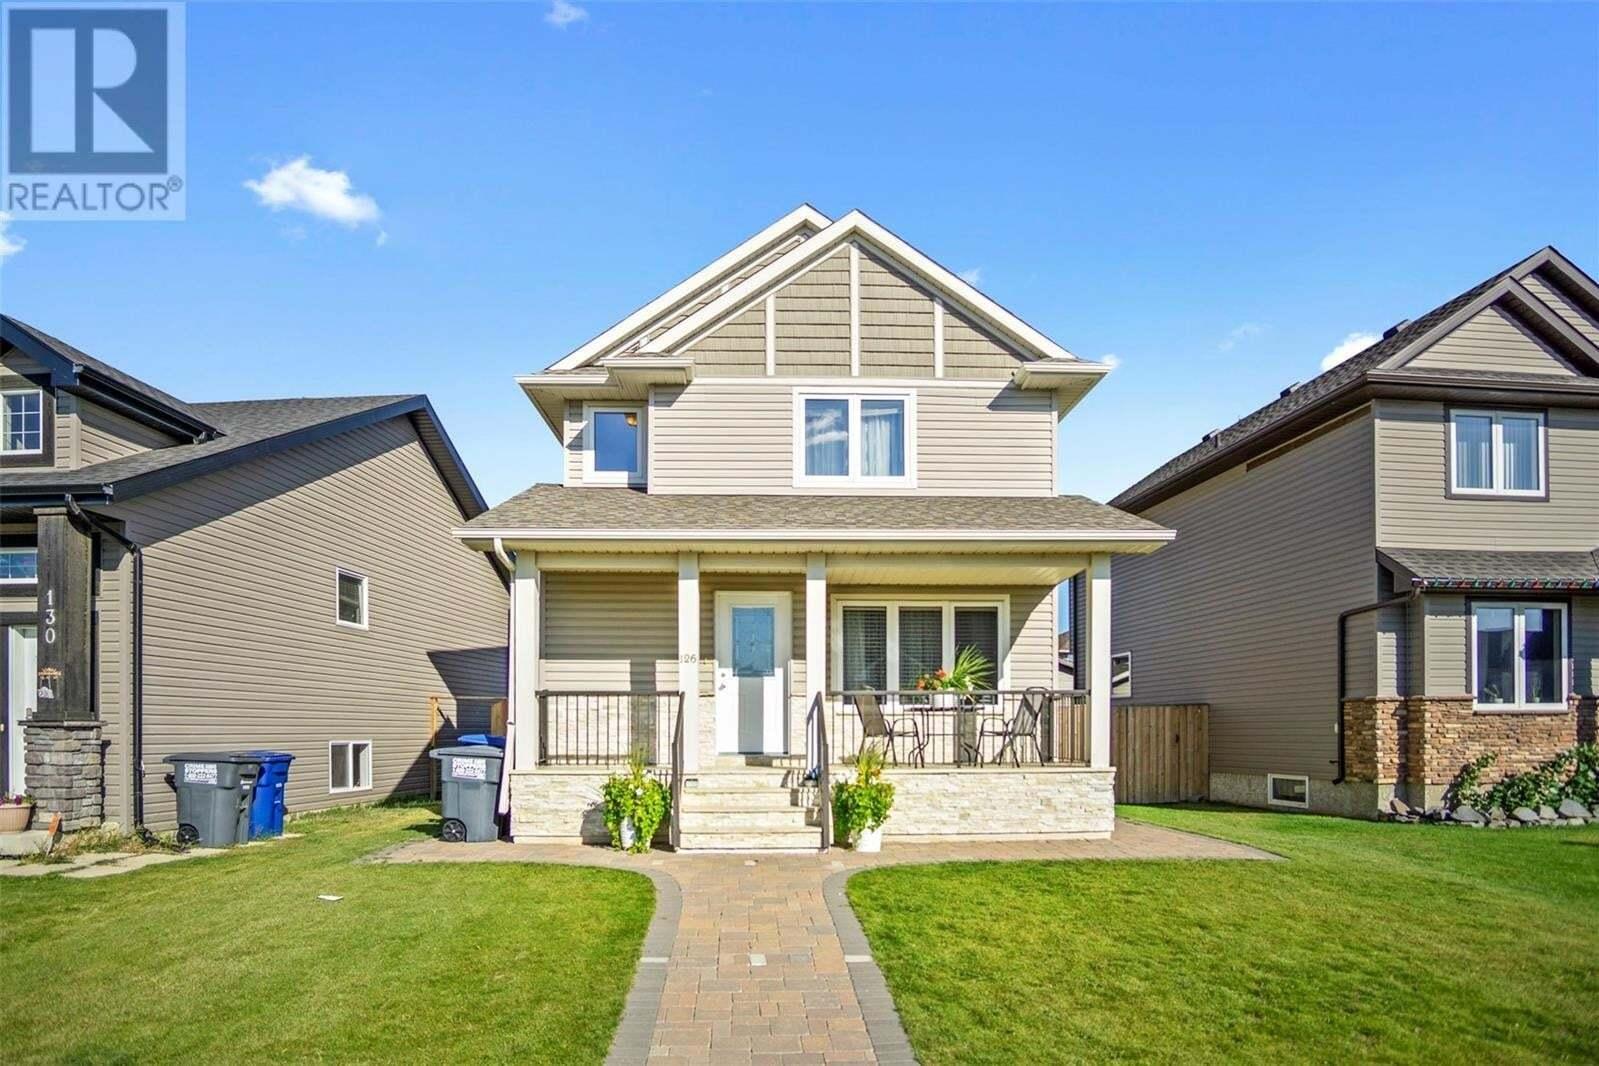 House for sale at 126 Coad Cres Saskatoon Saskatchewan - MLS: SK826688